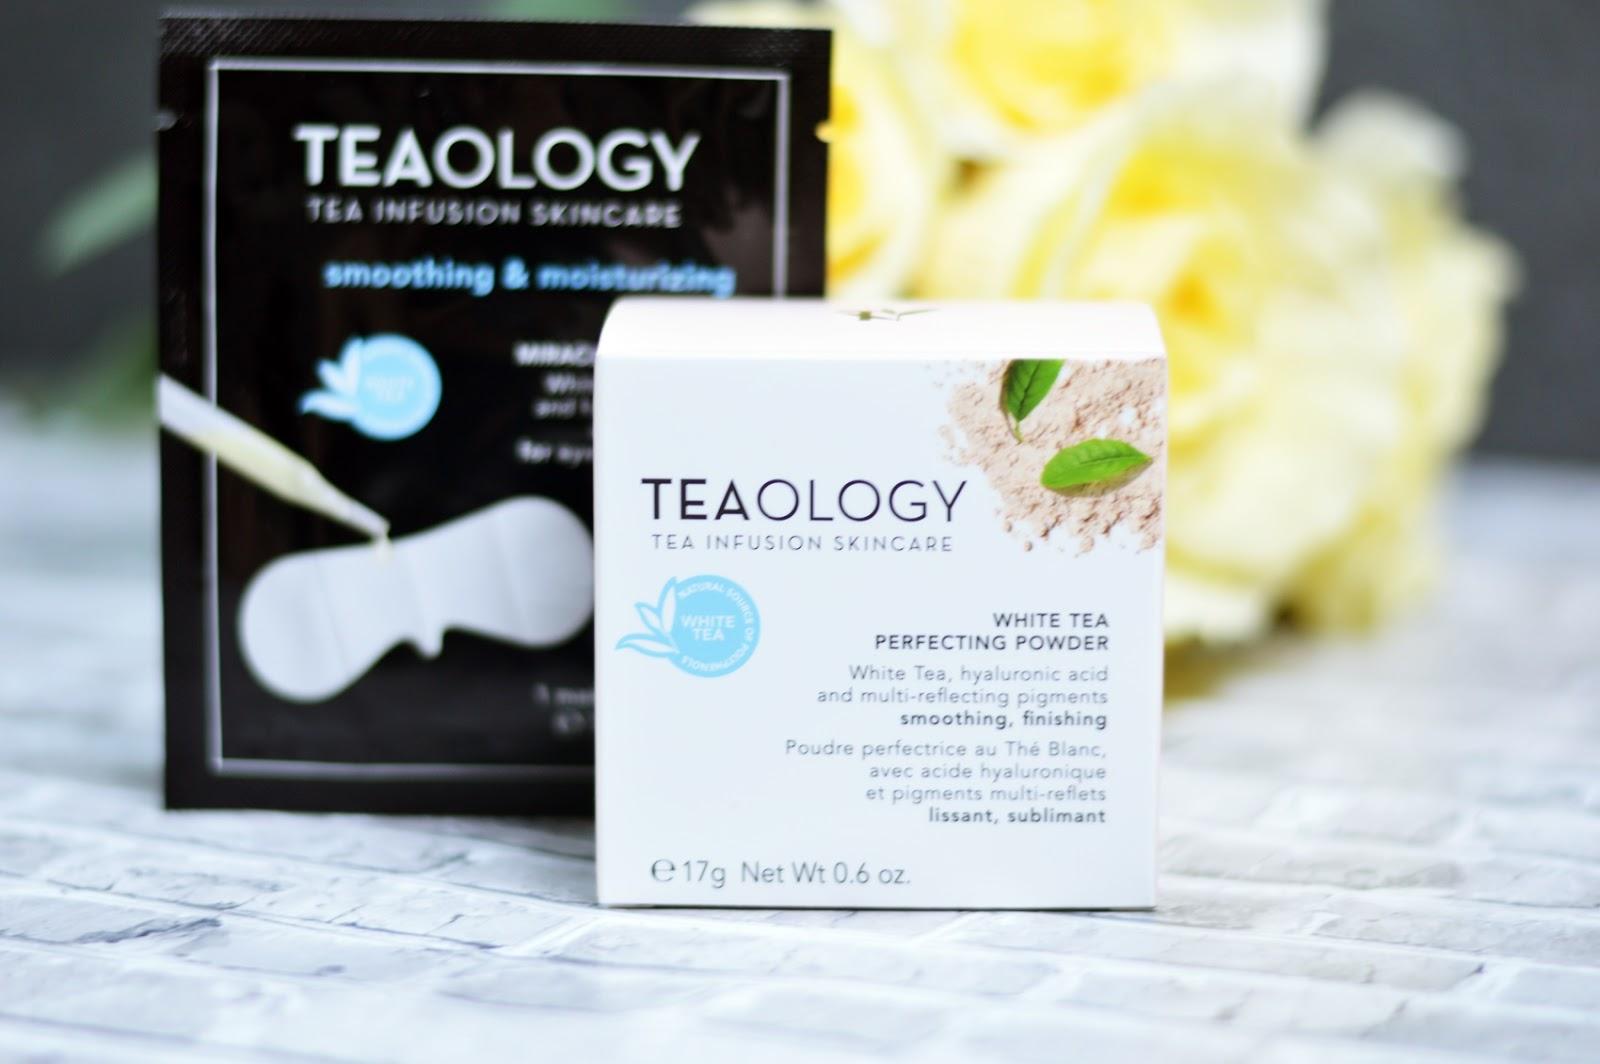 teaology - puder pielęgnujący